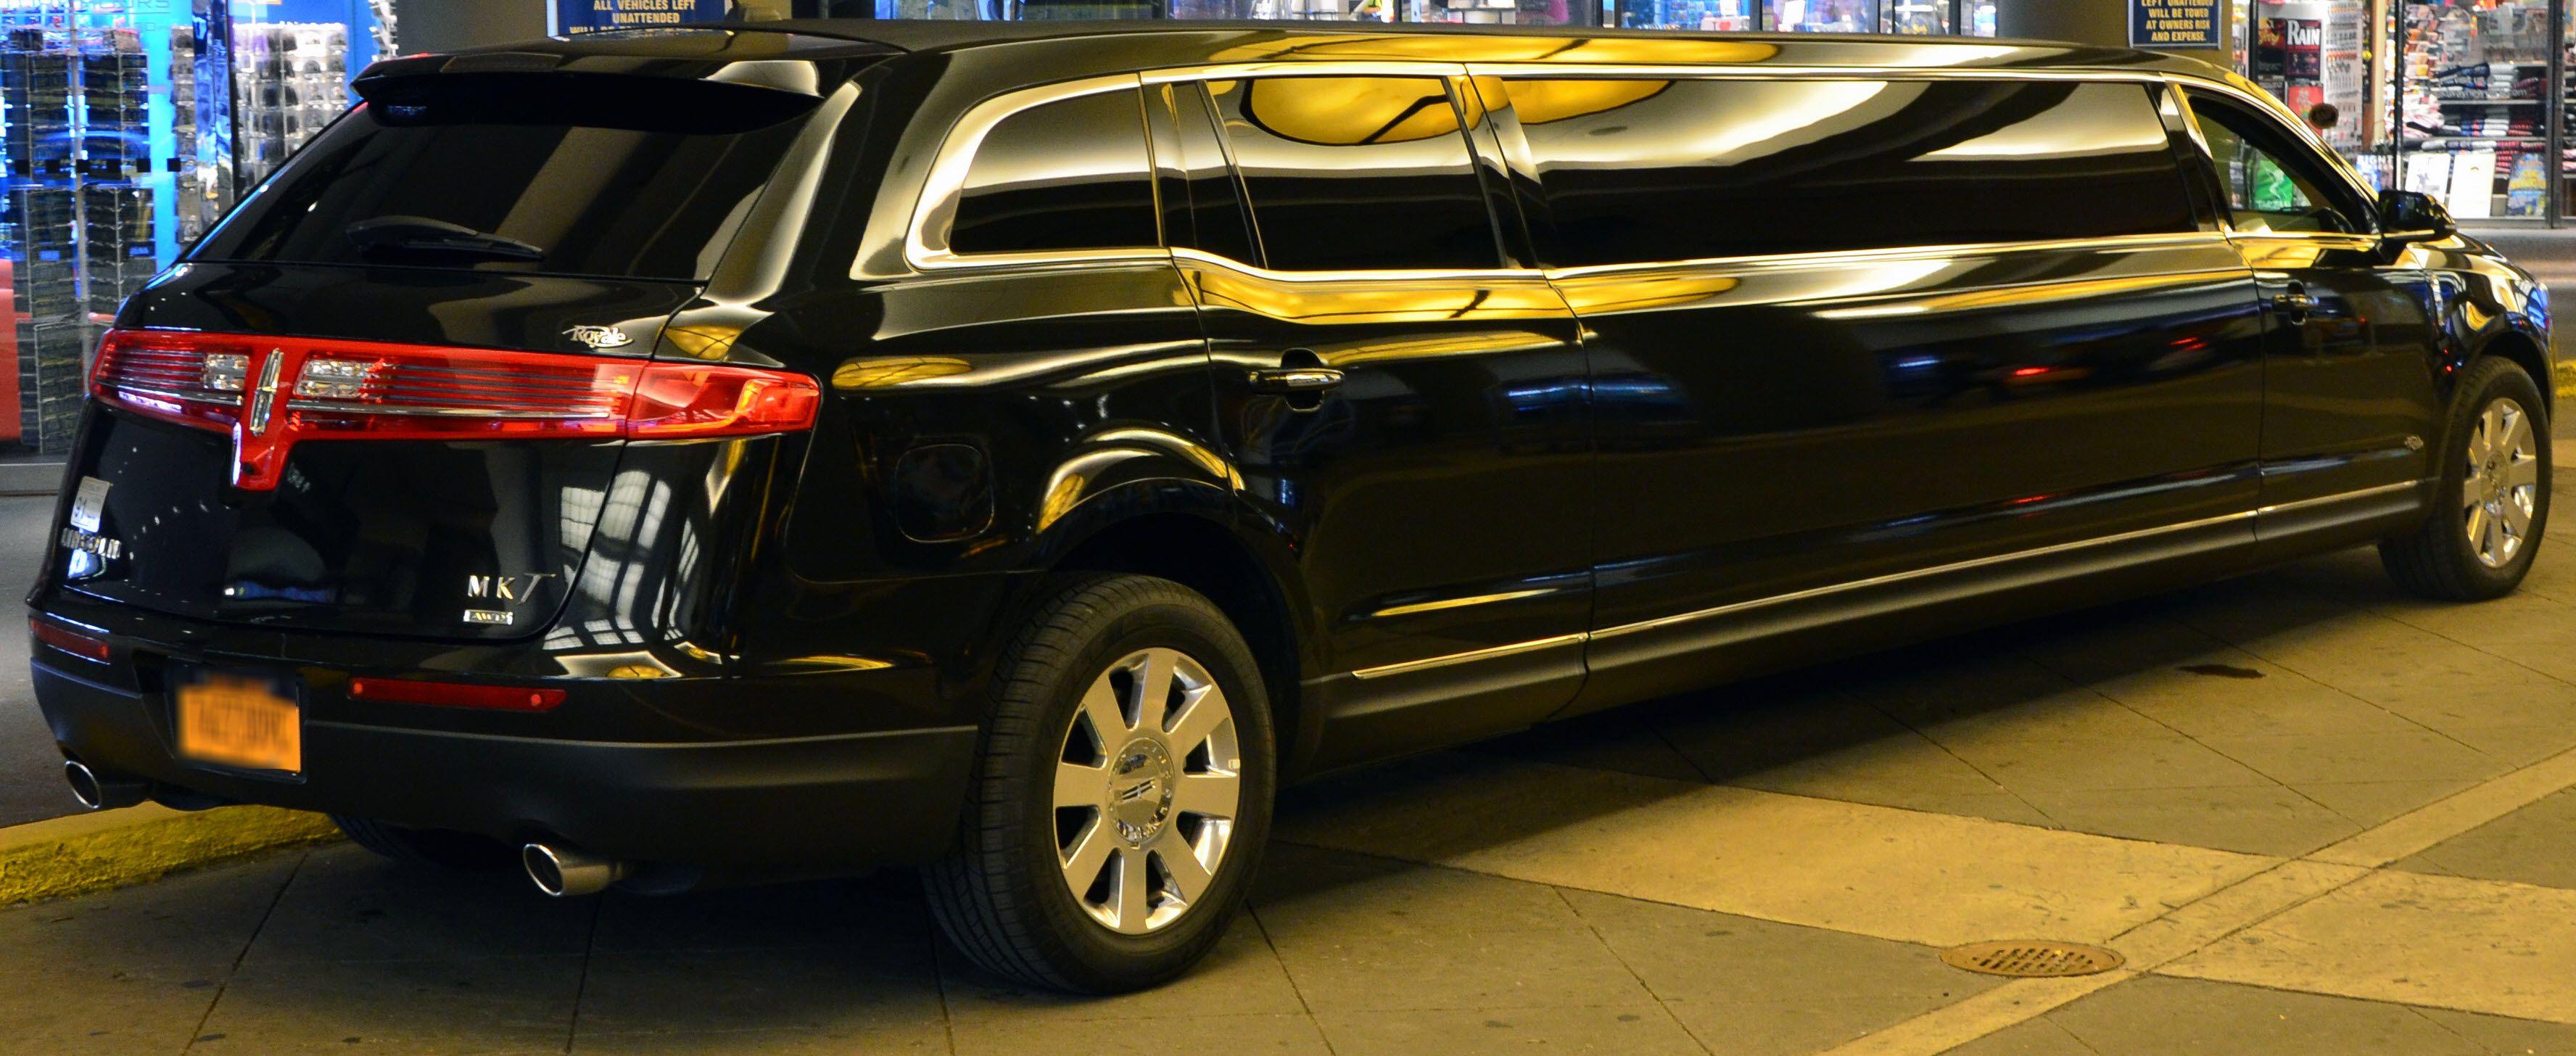 Limo Limos Limousine Car Service Limo Service Nj Http Www Daisylimo Com Limo Service Html Daisy Limo Nj Limousine Limo Transportation Services